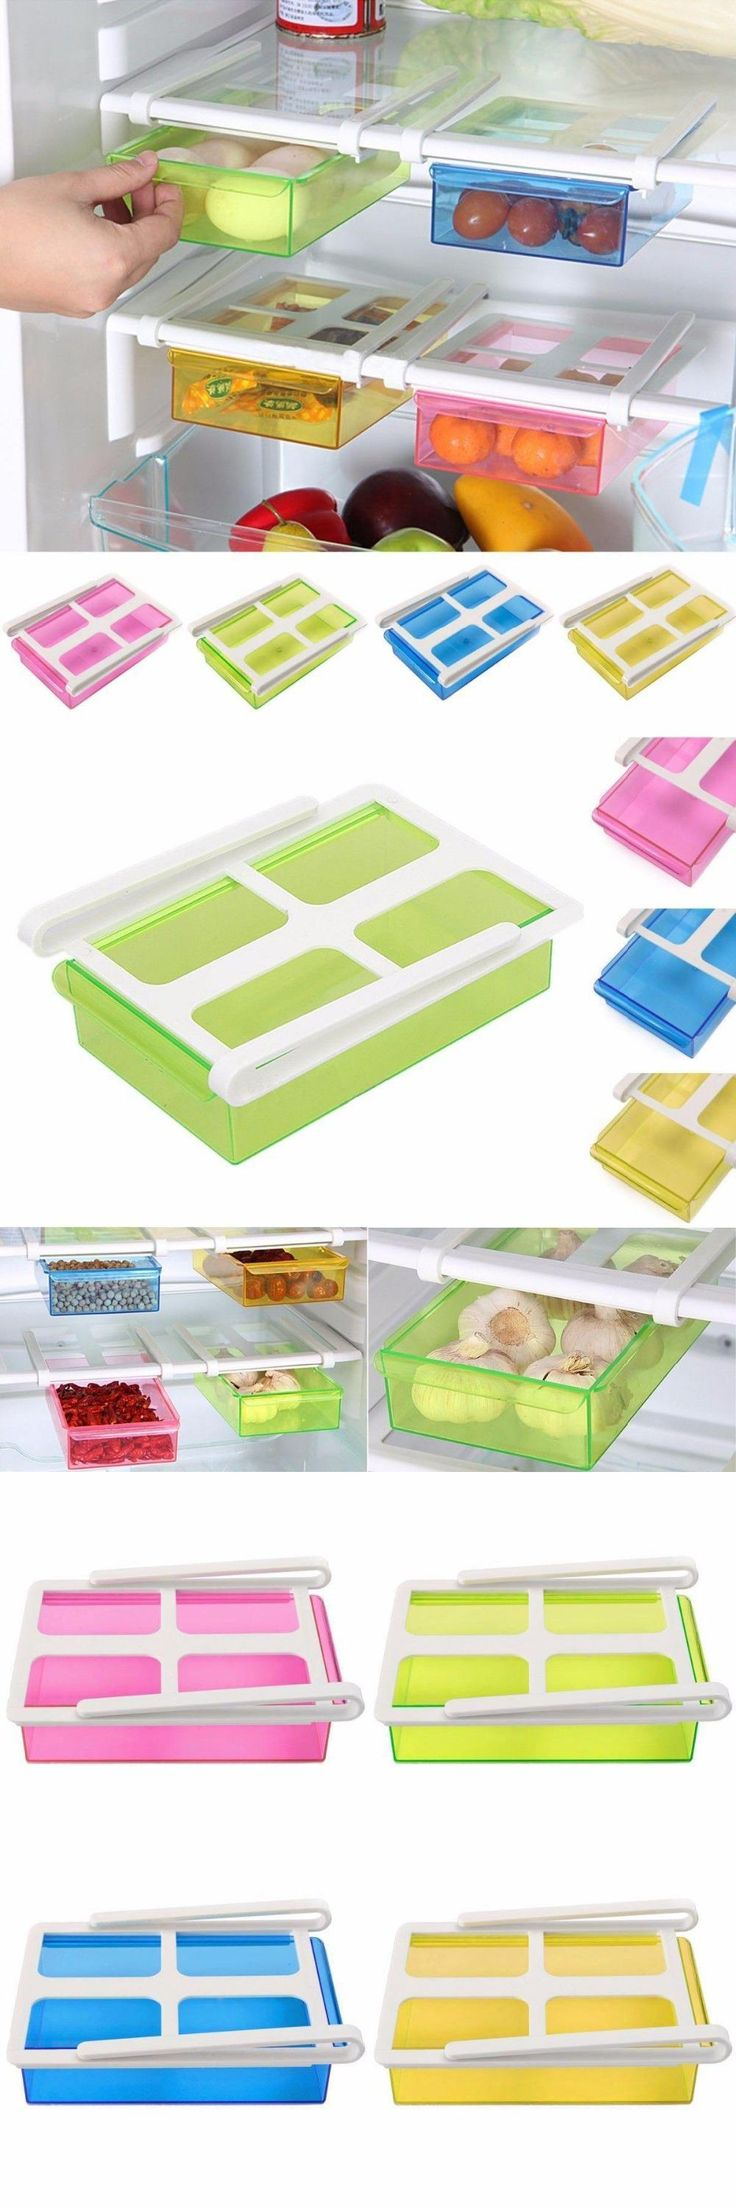 [Visit to Buy] New Arrival Slide Kitchen Fridge Freezer Space Saver Organizer Storage Rack Shelf Holder Tool 4Color #Advertisement